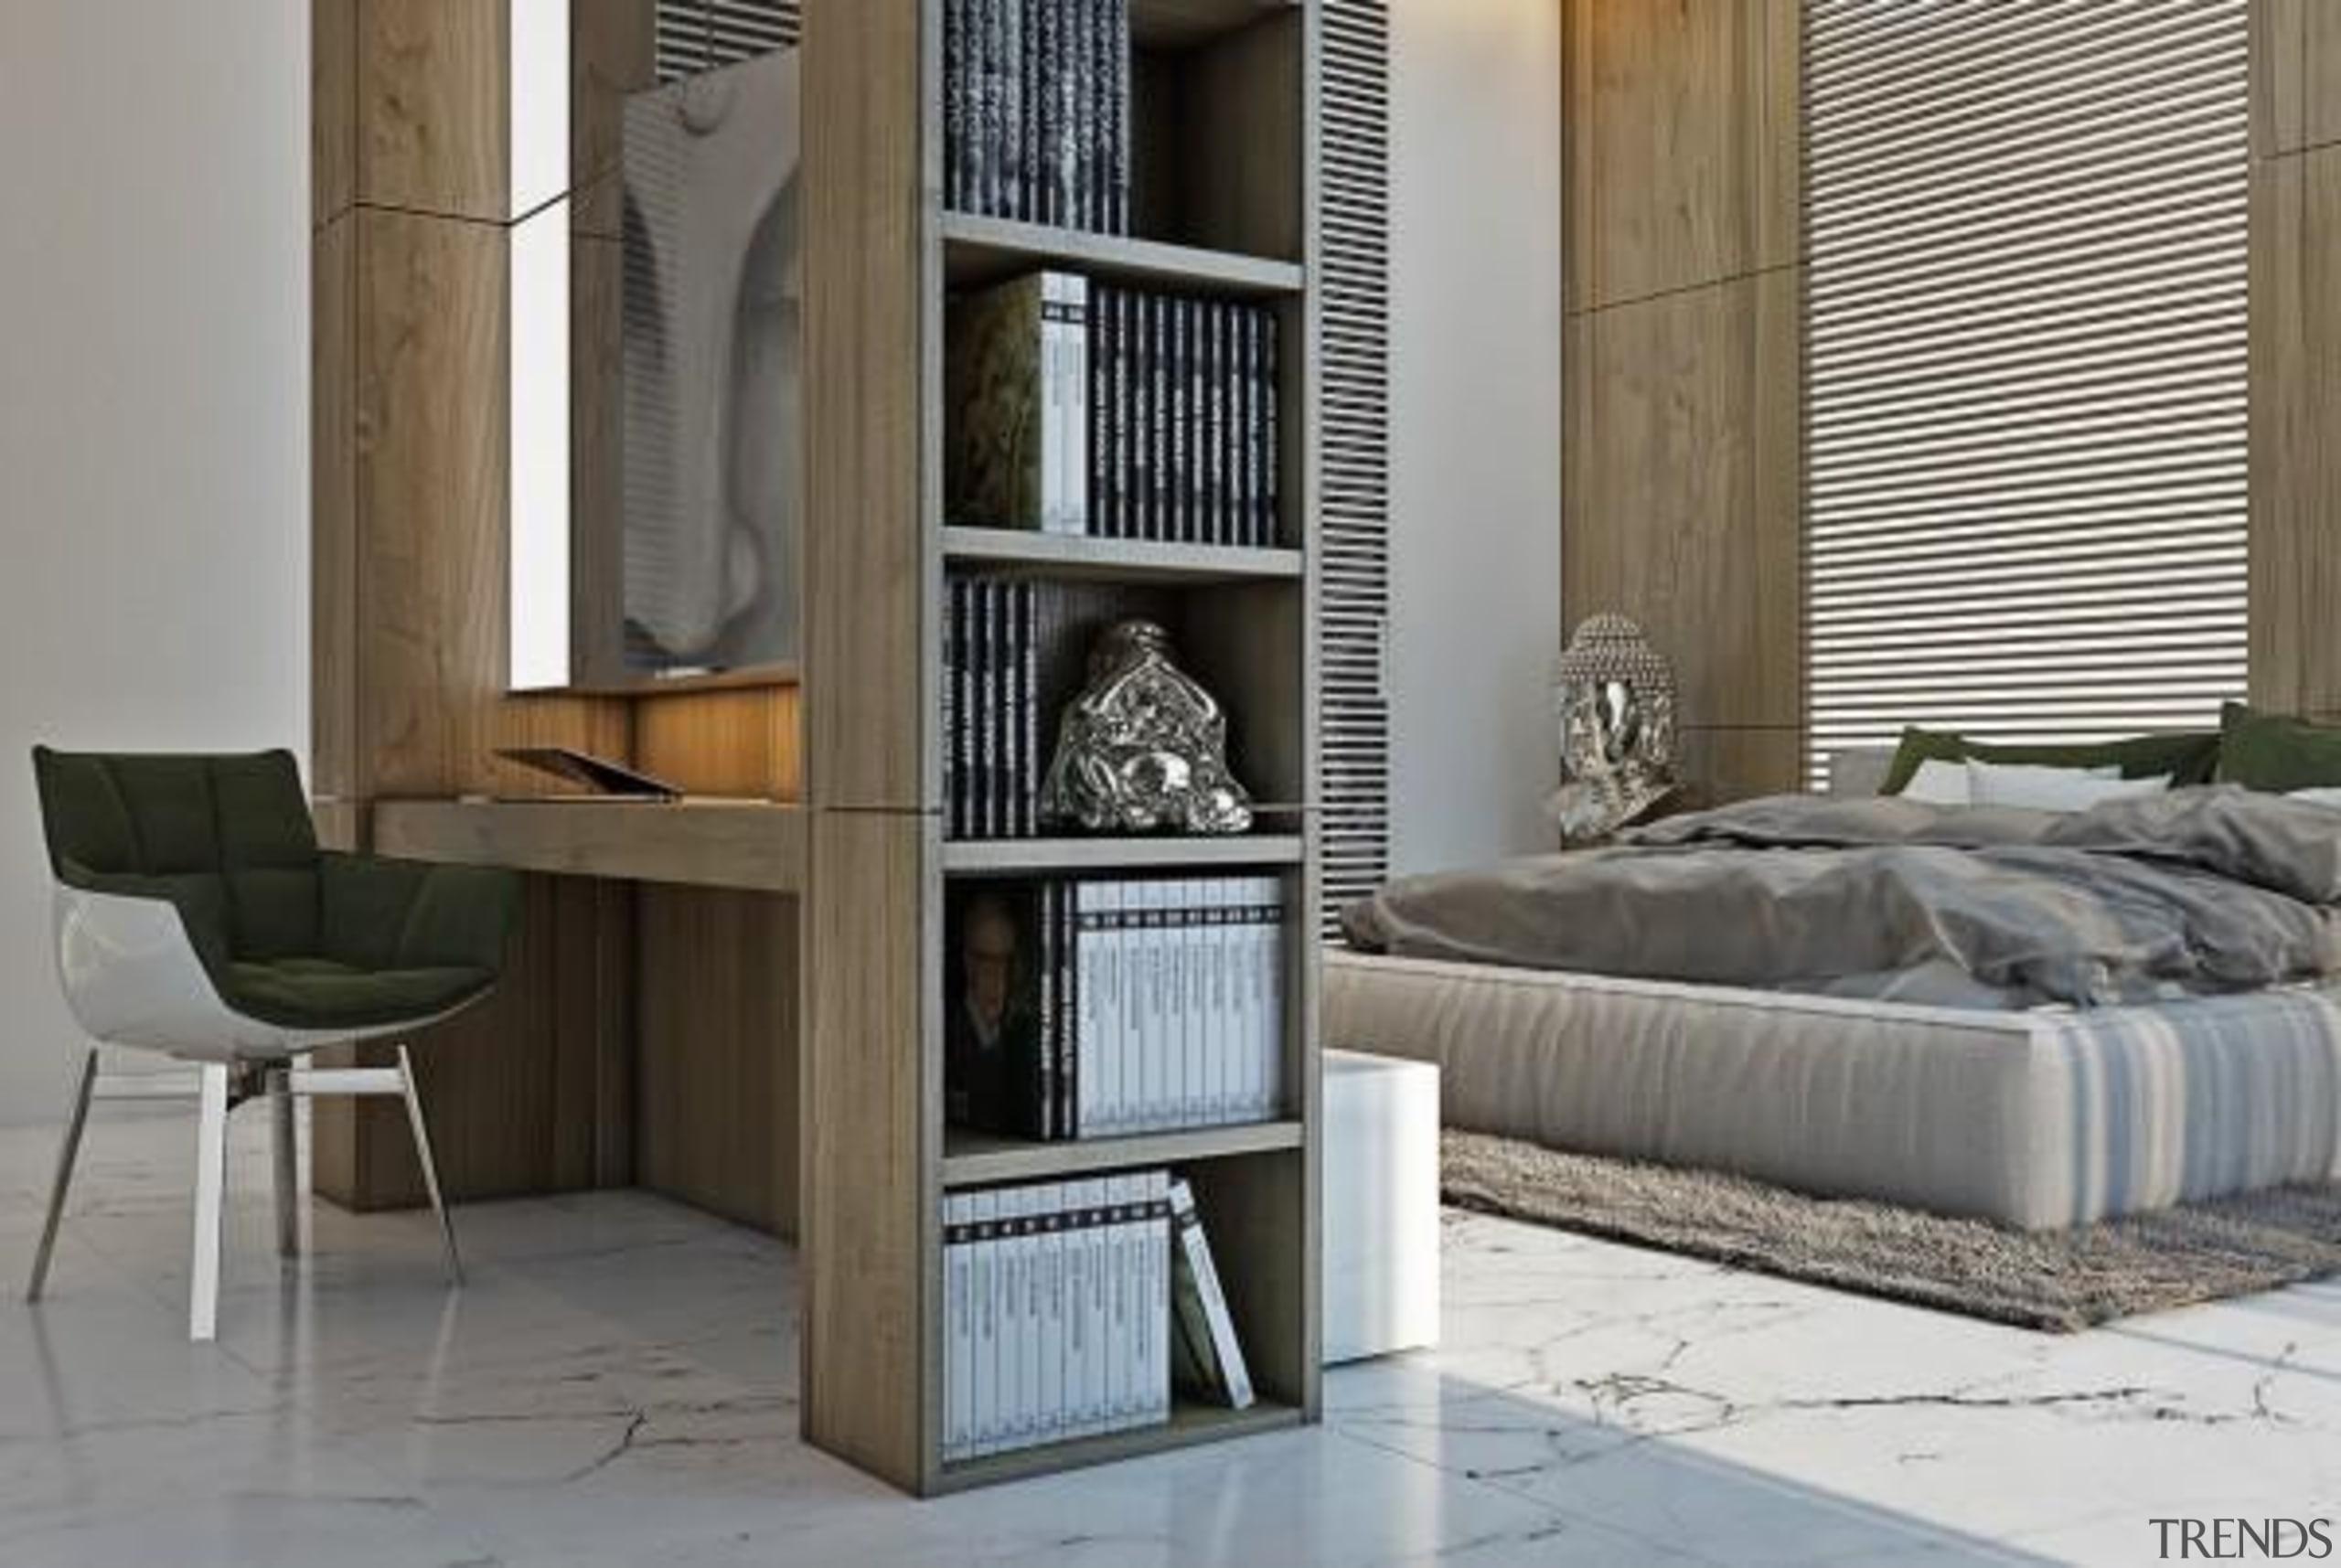 modern bedroom - Masculine Apartments - furniture   furniture, interior design, shelving, table, gray